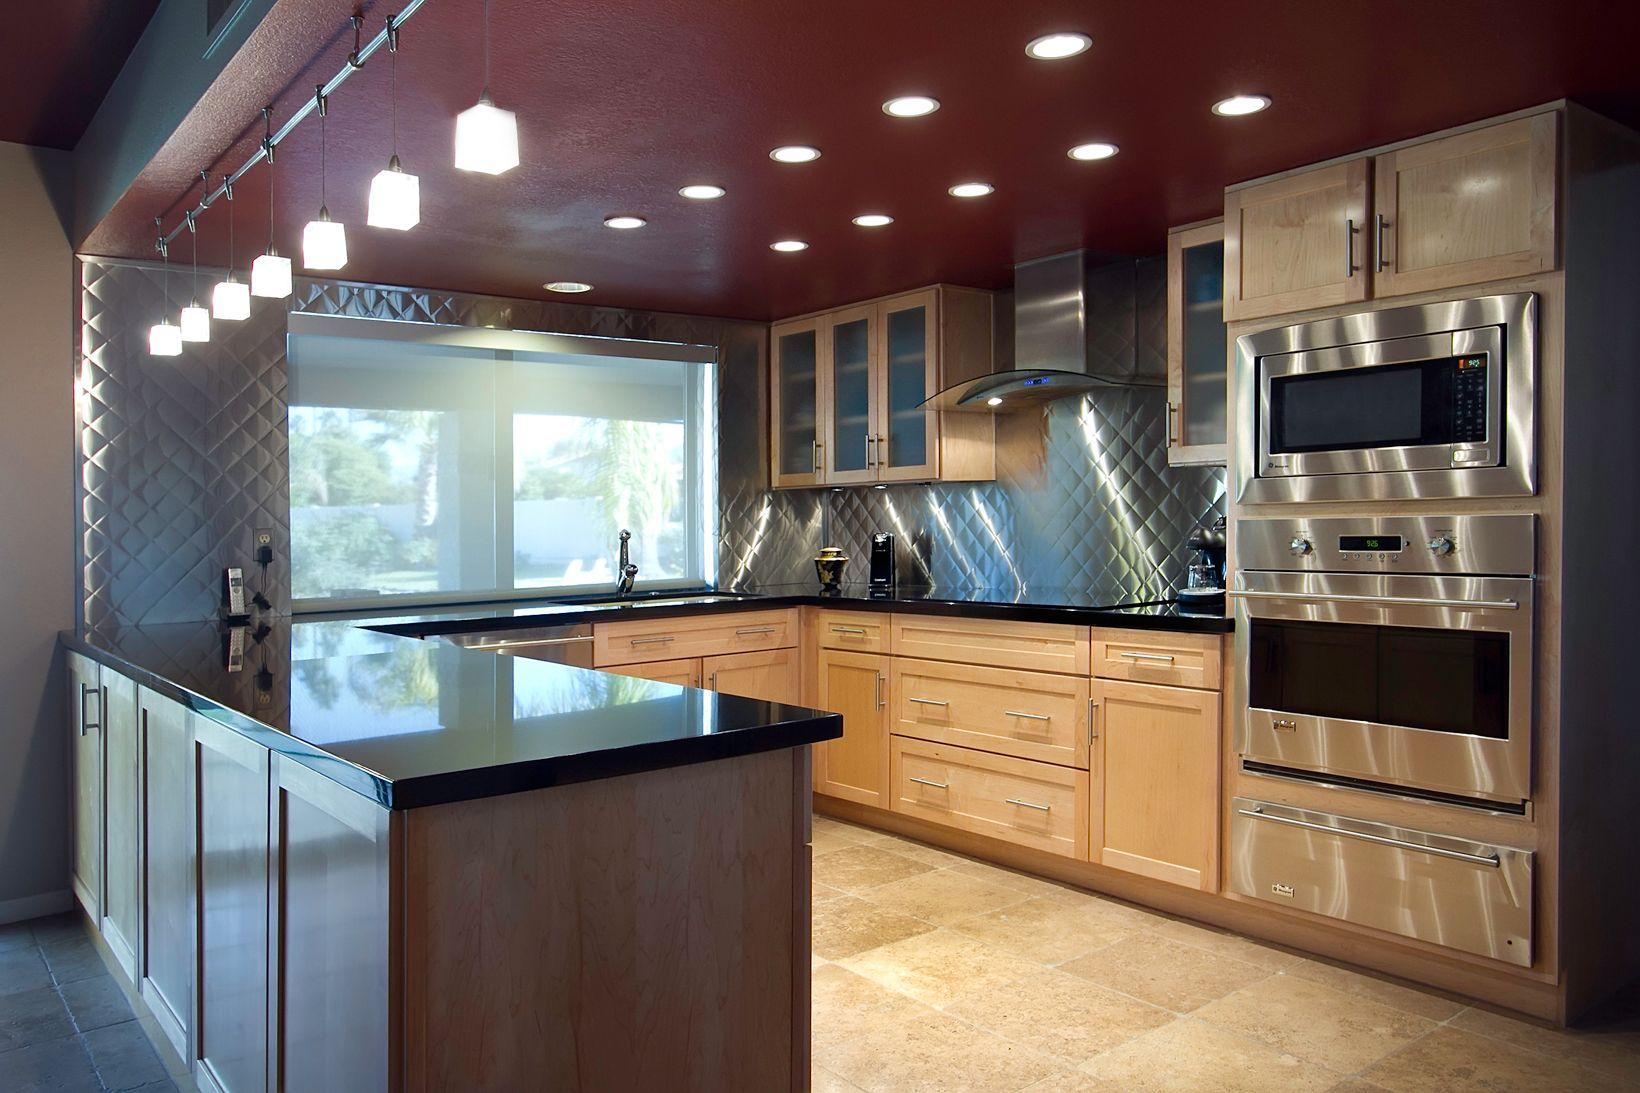 Princeton Kitchen Remodeling Contractor - DES